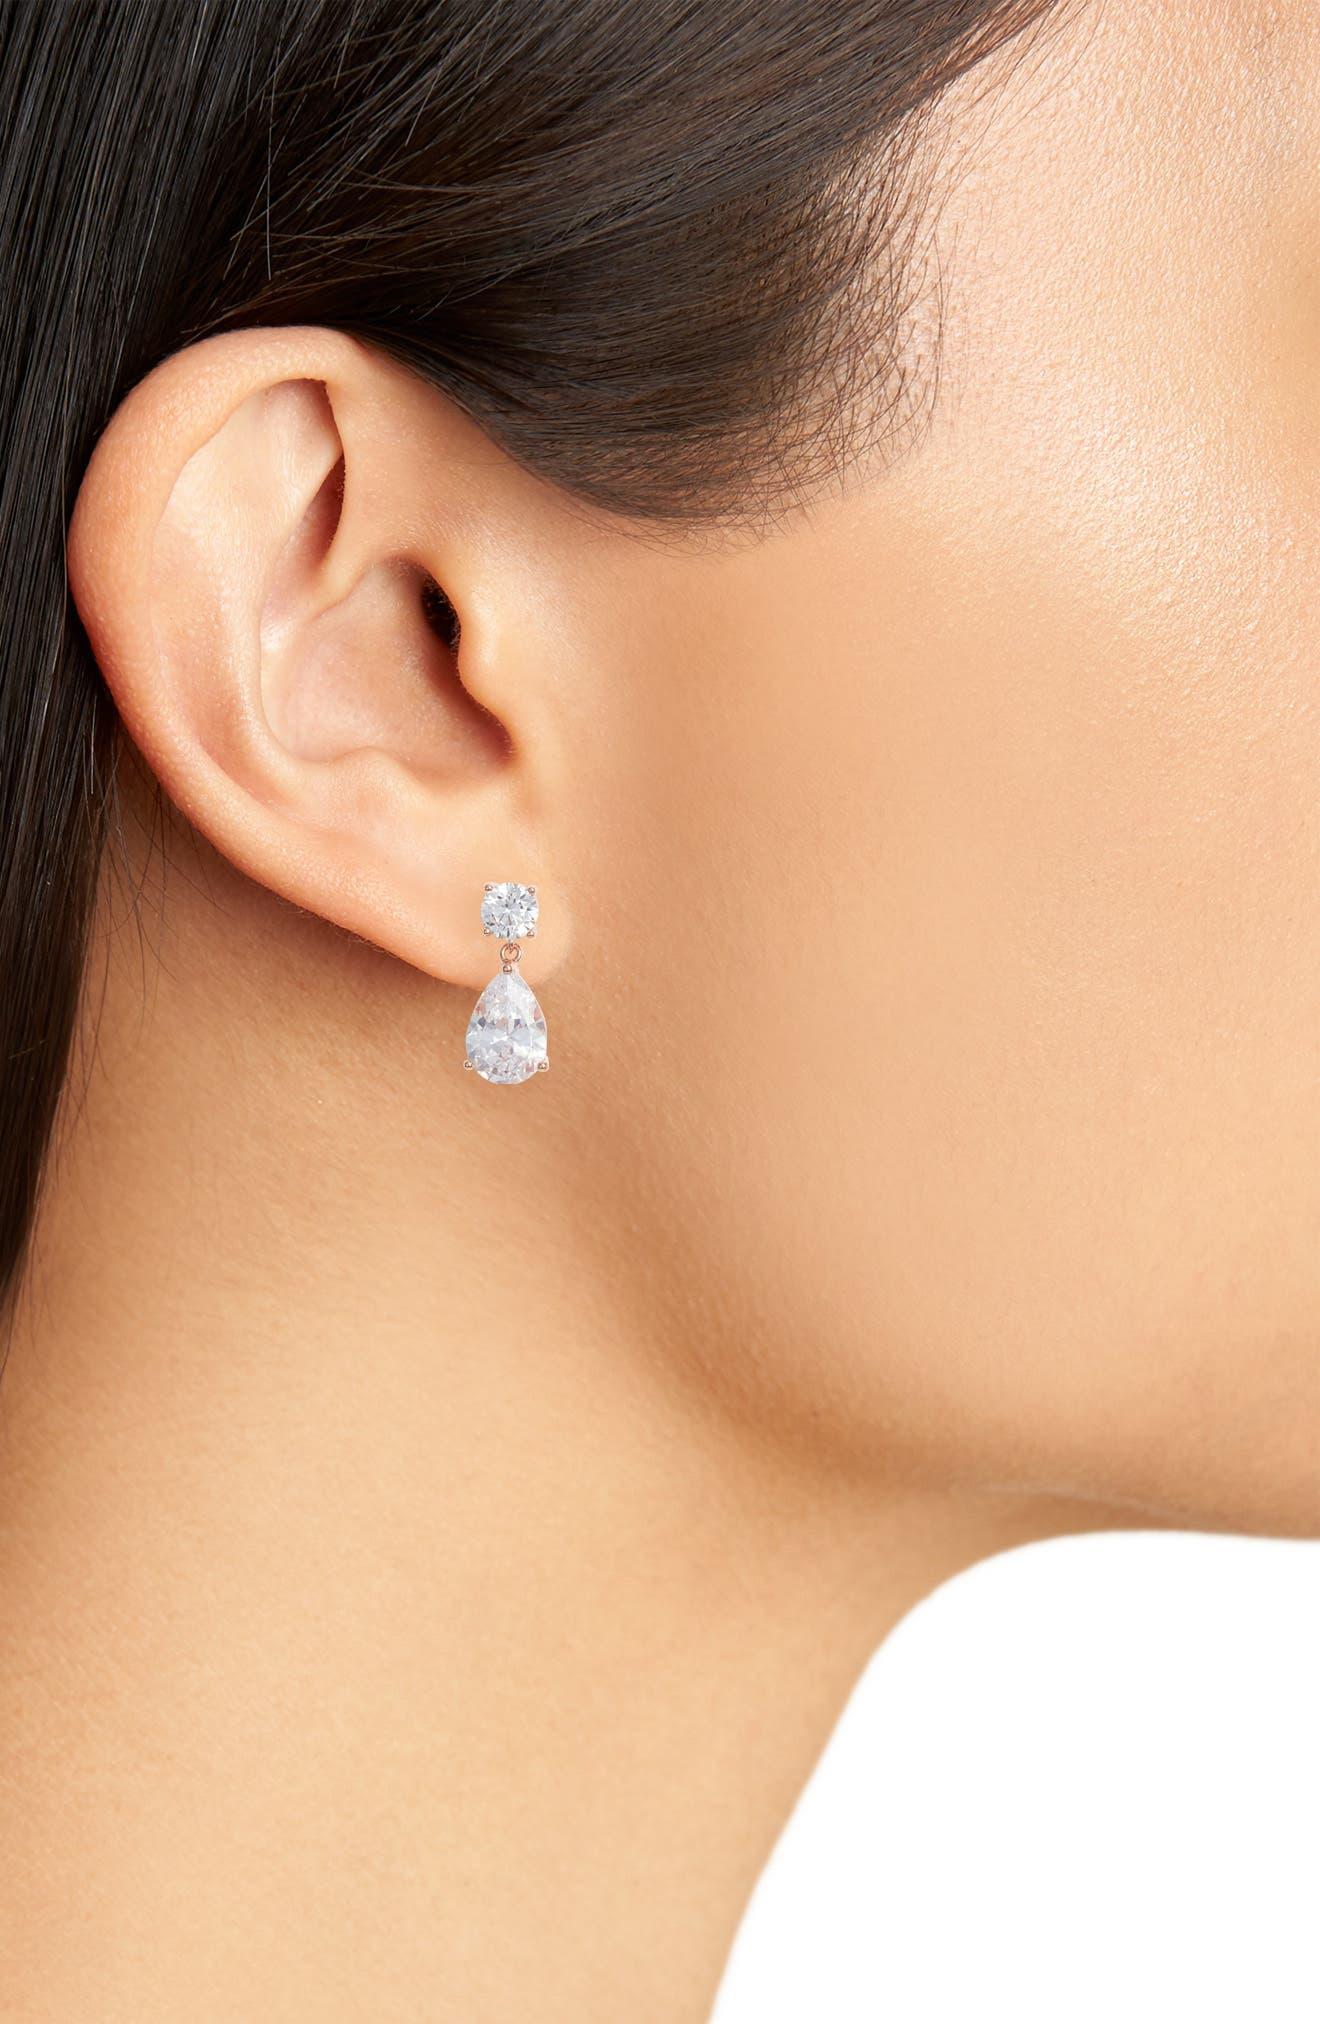 NORDSTROM, Cubic Zirconia Teardrop Earrings, Alternate thumbnail 2, color, CLEAR- ROSE GOLD